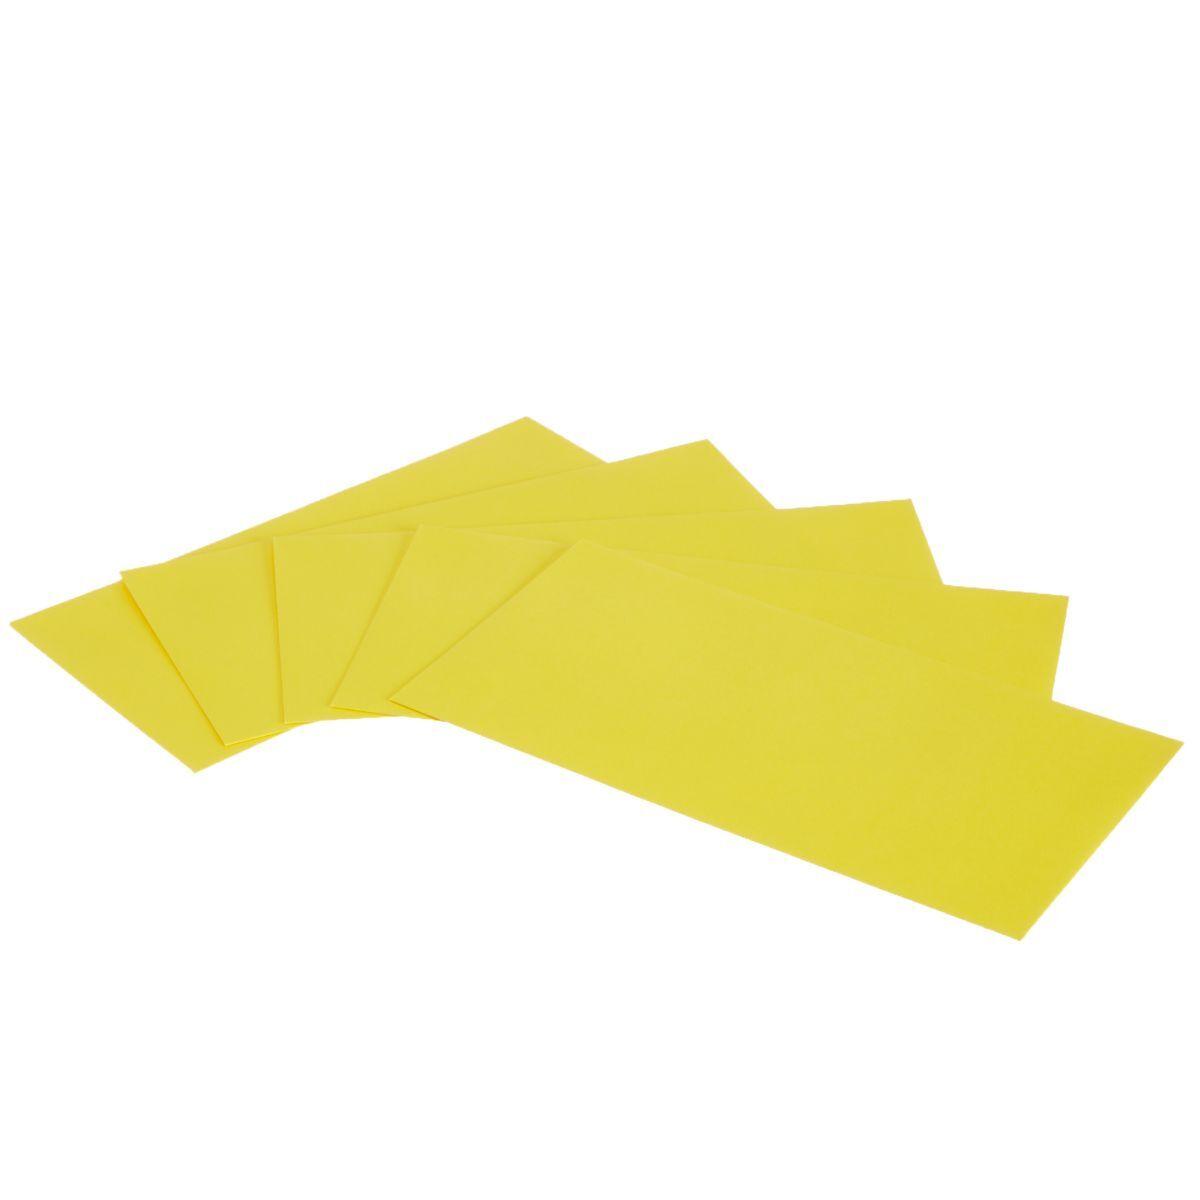 Pollen Self Seal Envelope  DL 120gsm Intensive Yellow